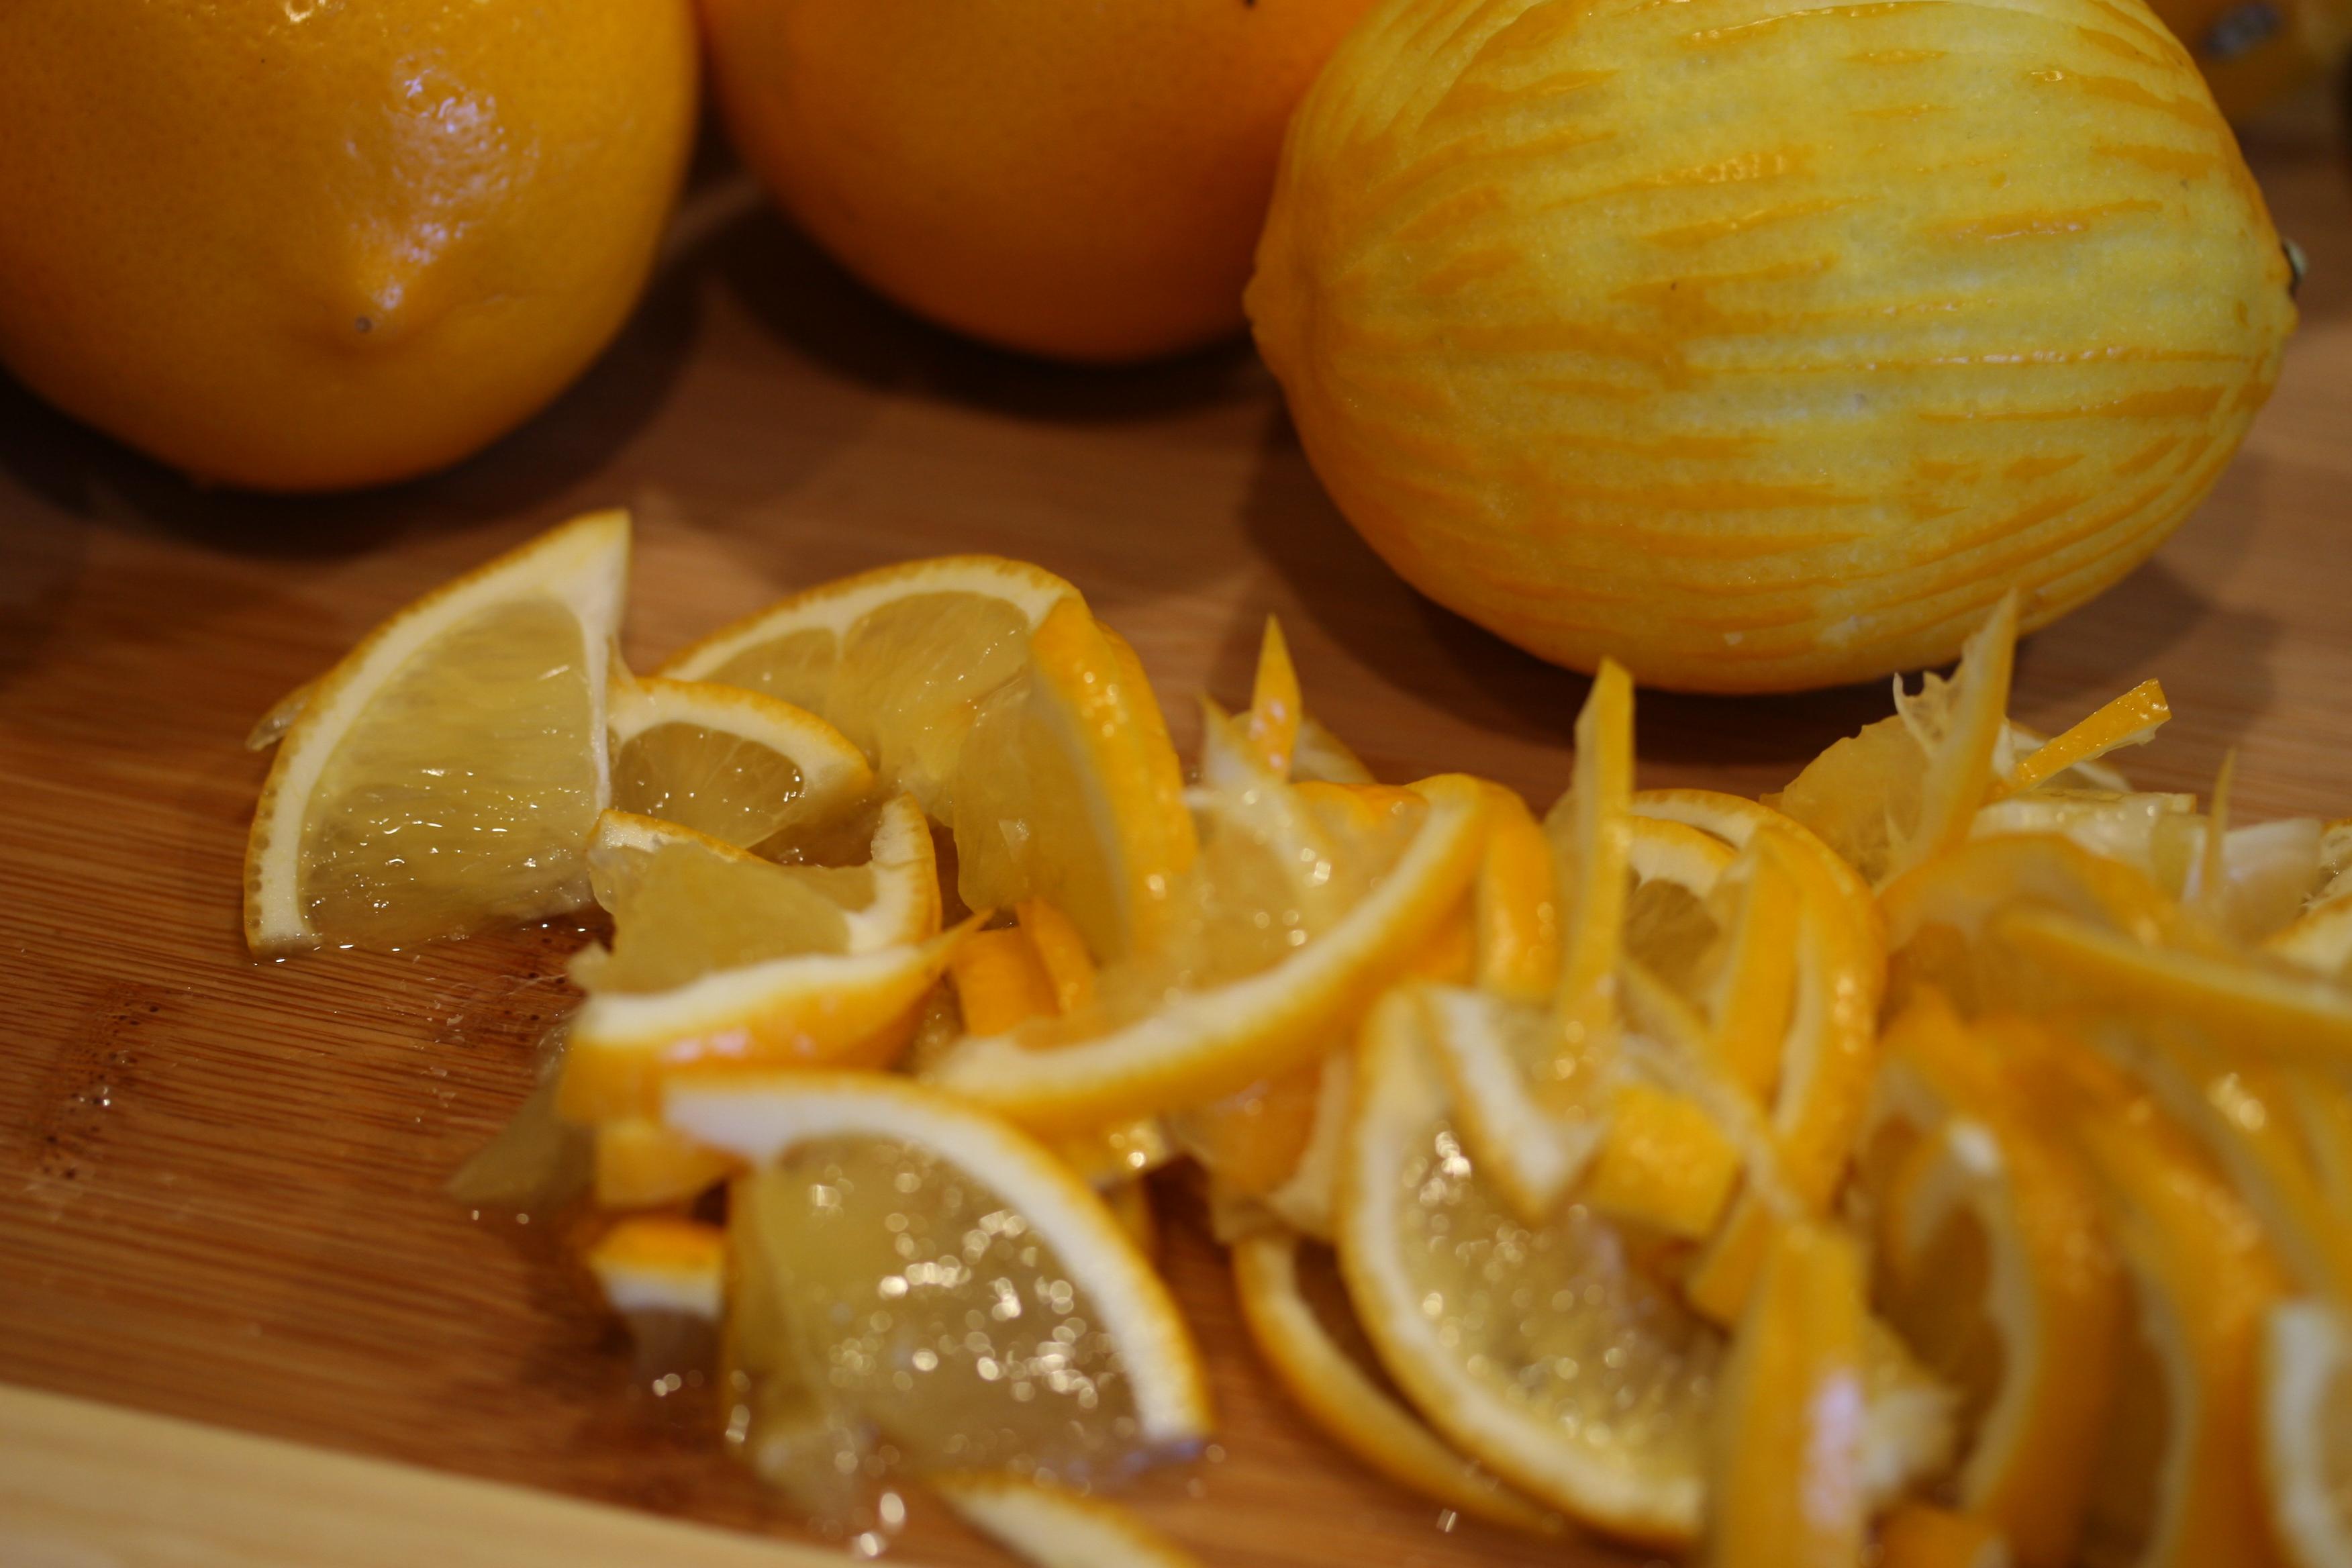 Meyer Lemon Marmalade | A Plate Full